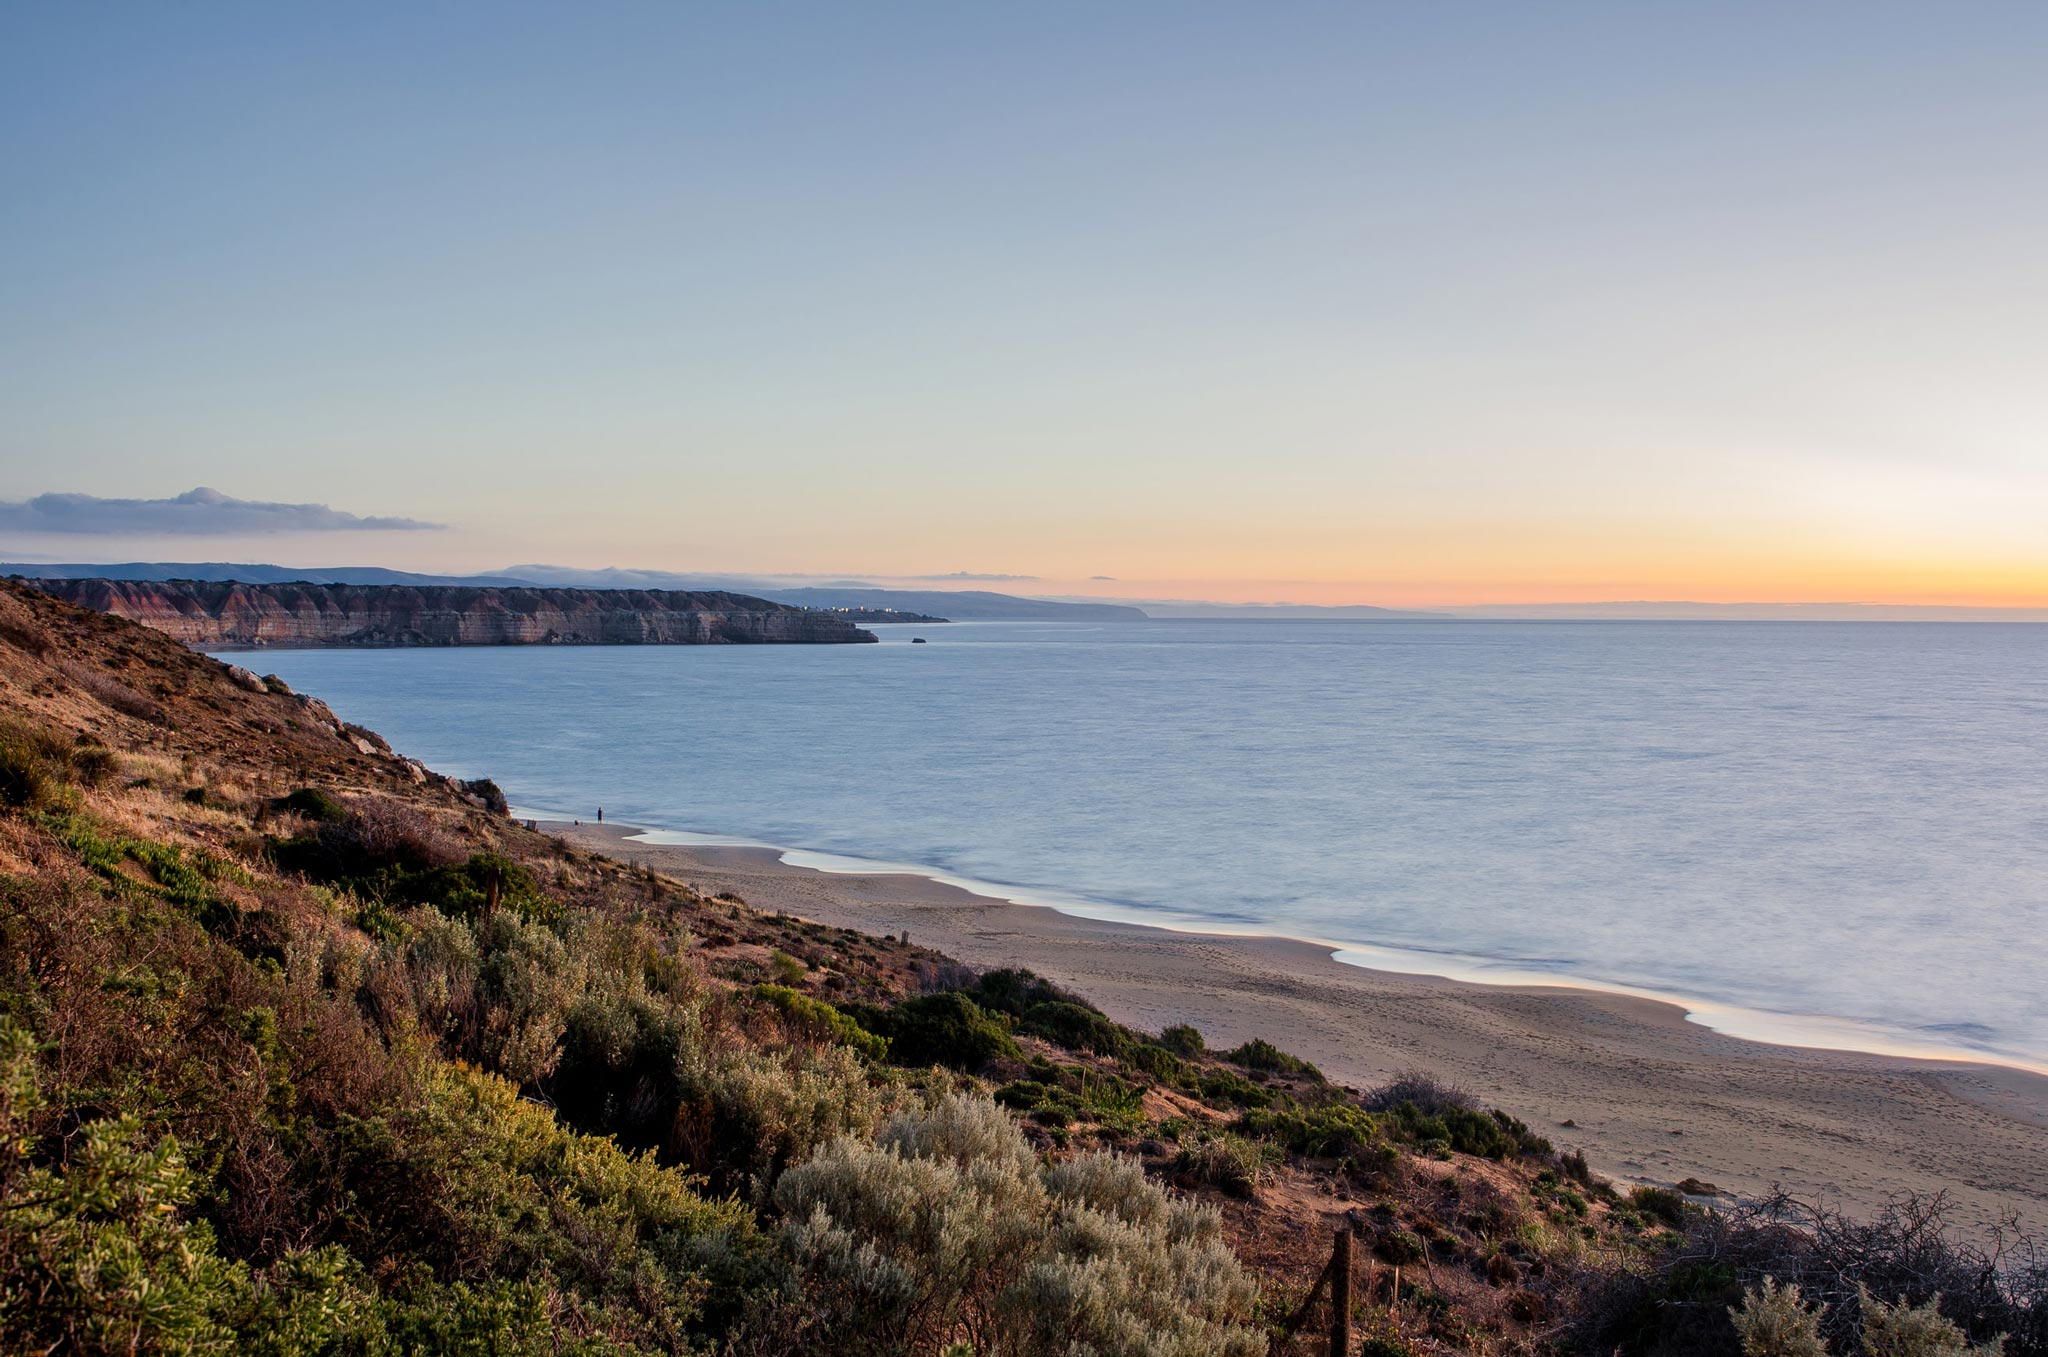 Paesaggi-Australia - DSC 4177 - Fotografo di Paesaggi Australia viaggio - Fotografo di Paesaggi Australia viaggio